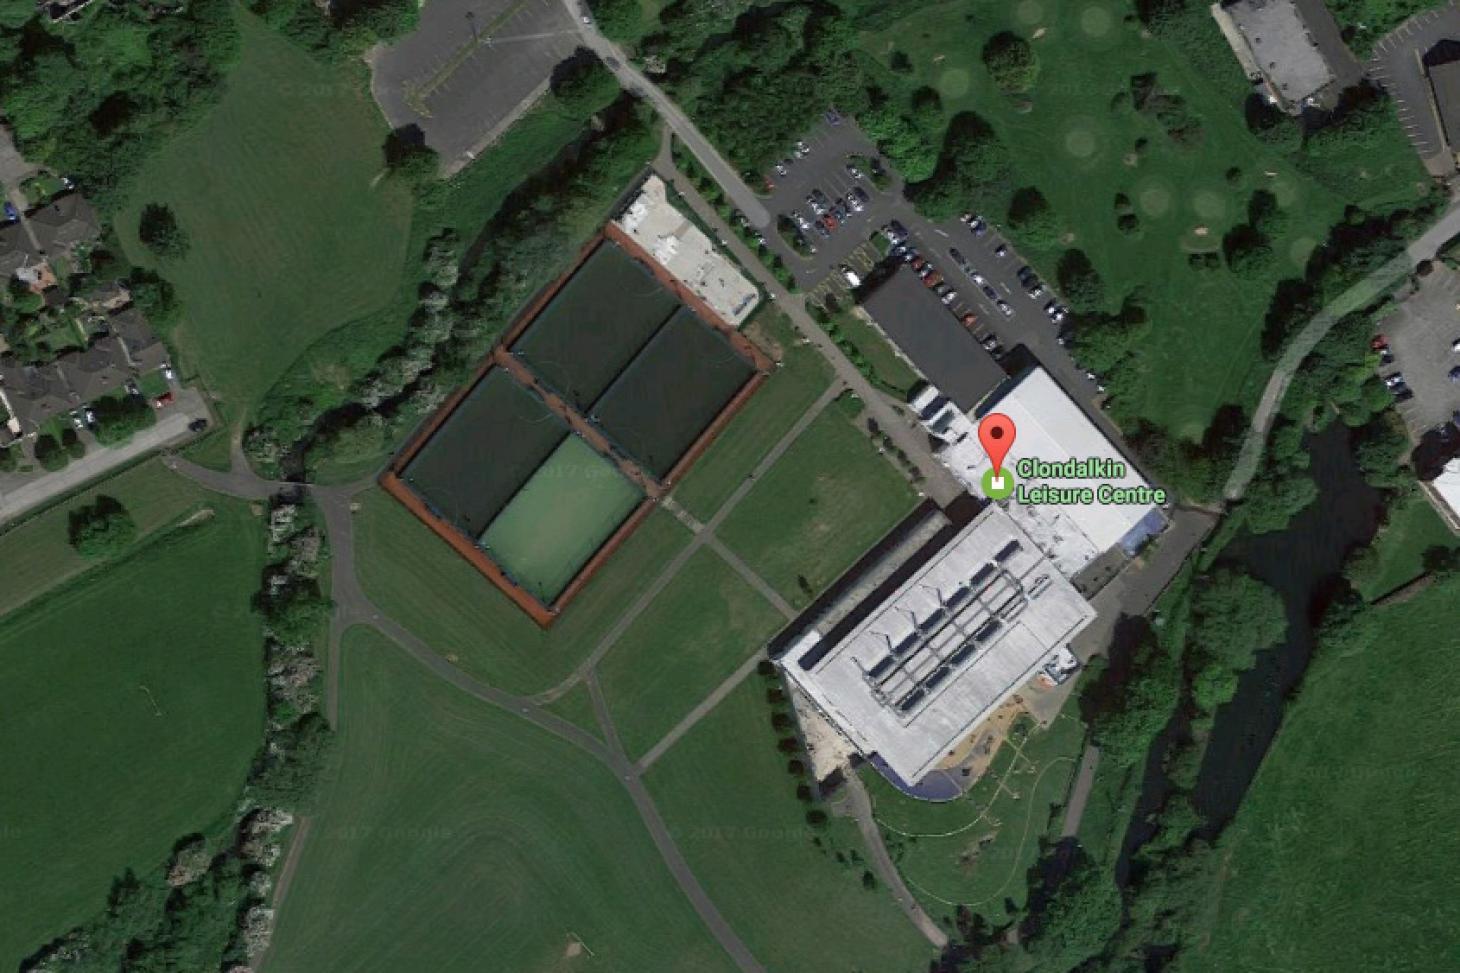 Clondalkin Leisure Centre Outdoor | Astroturf tennis court